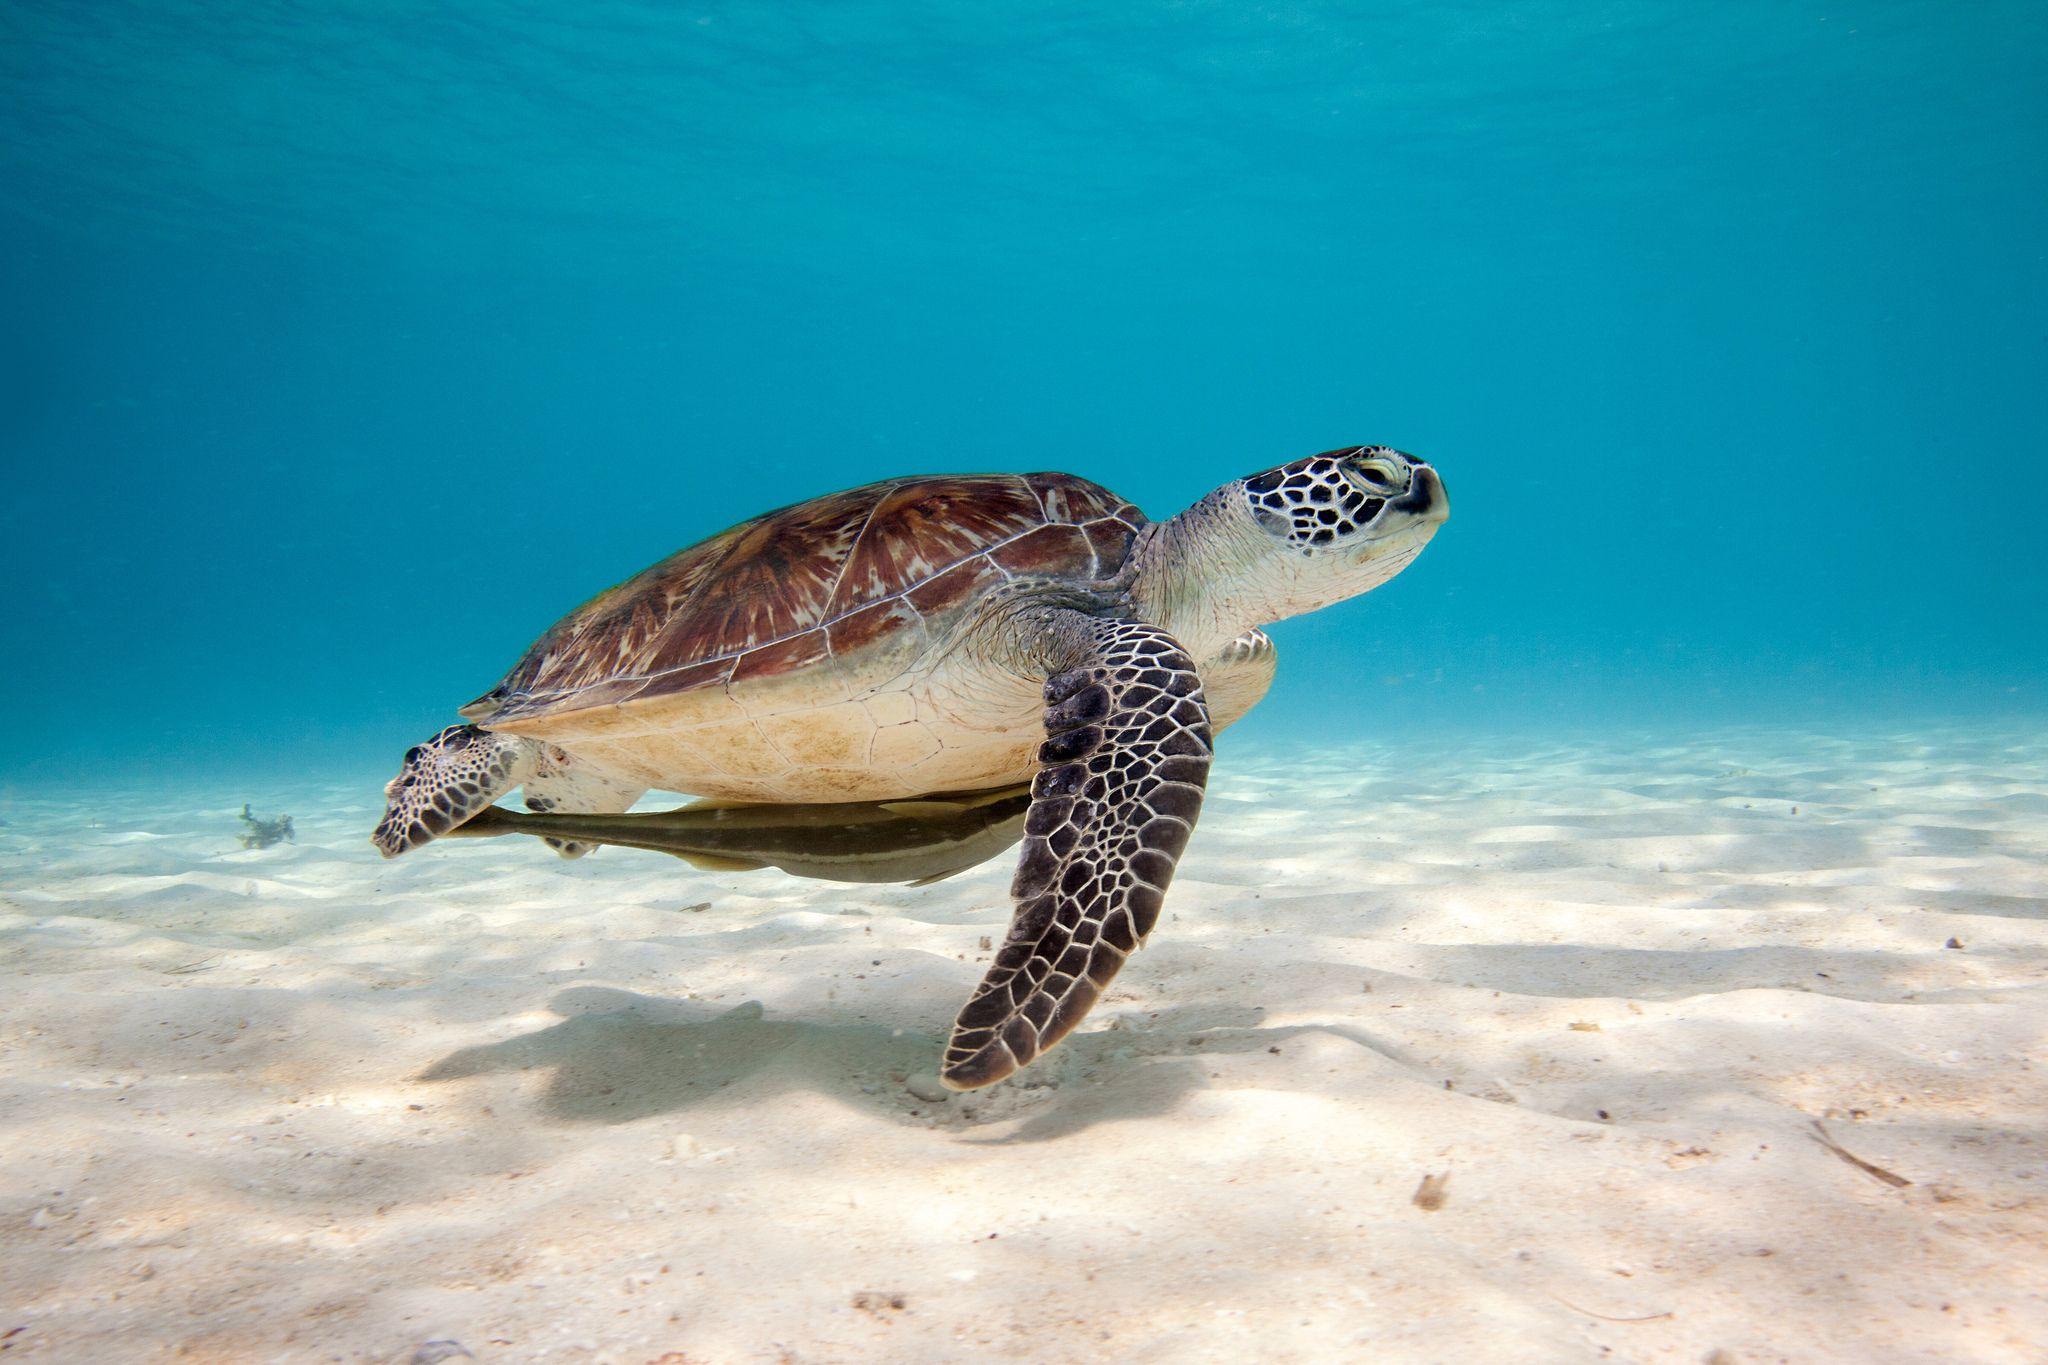 Download Turtle Sea Water Sand Bottom Shell Wallpaper Picsinhd Turtle Wallpaper Sea Turtle Wallpaper Sea Turtle